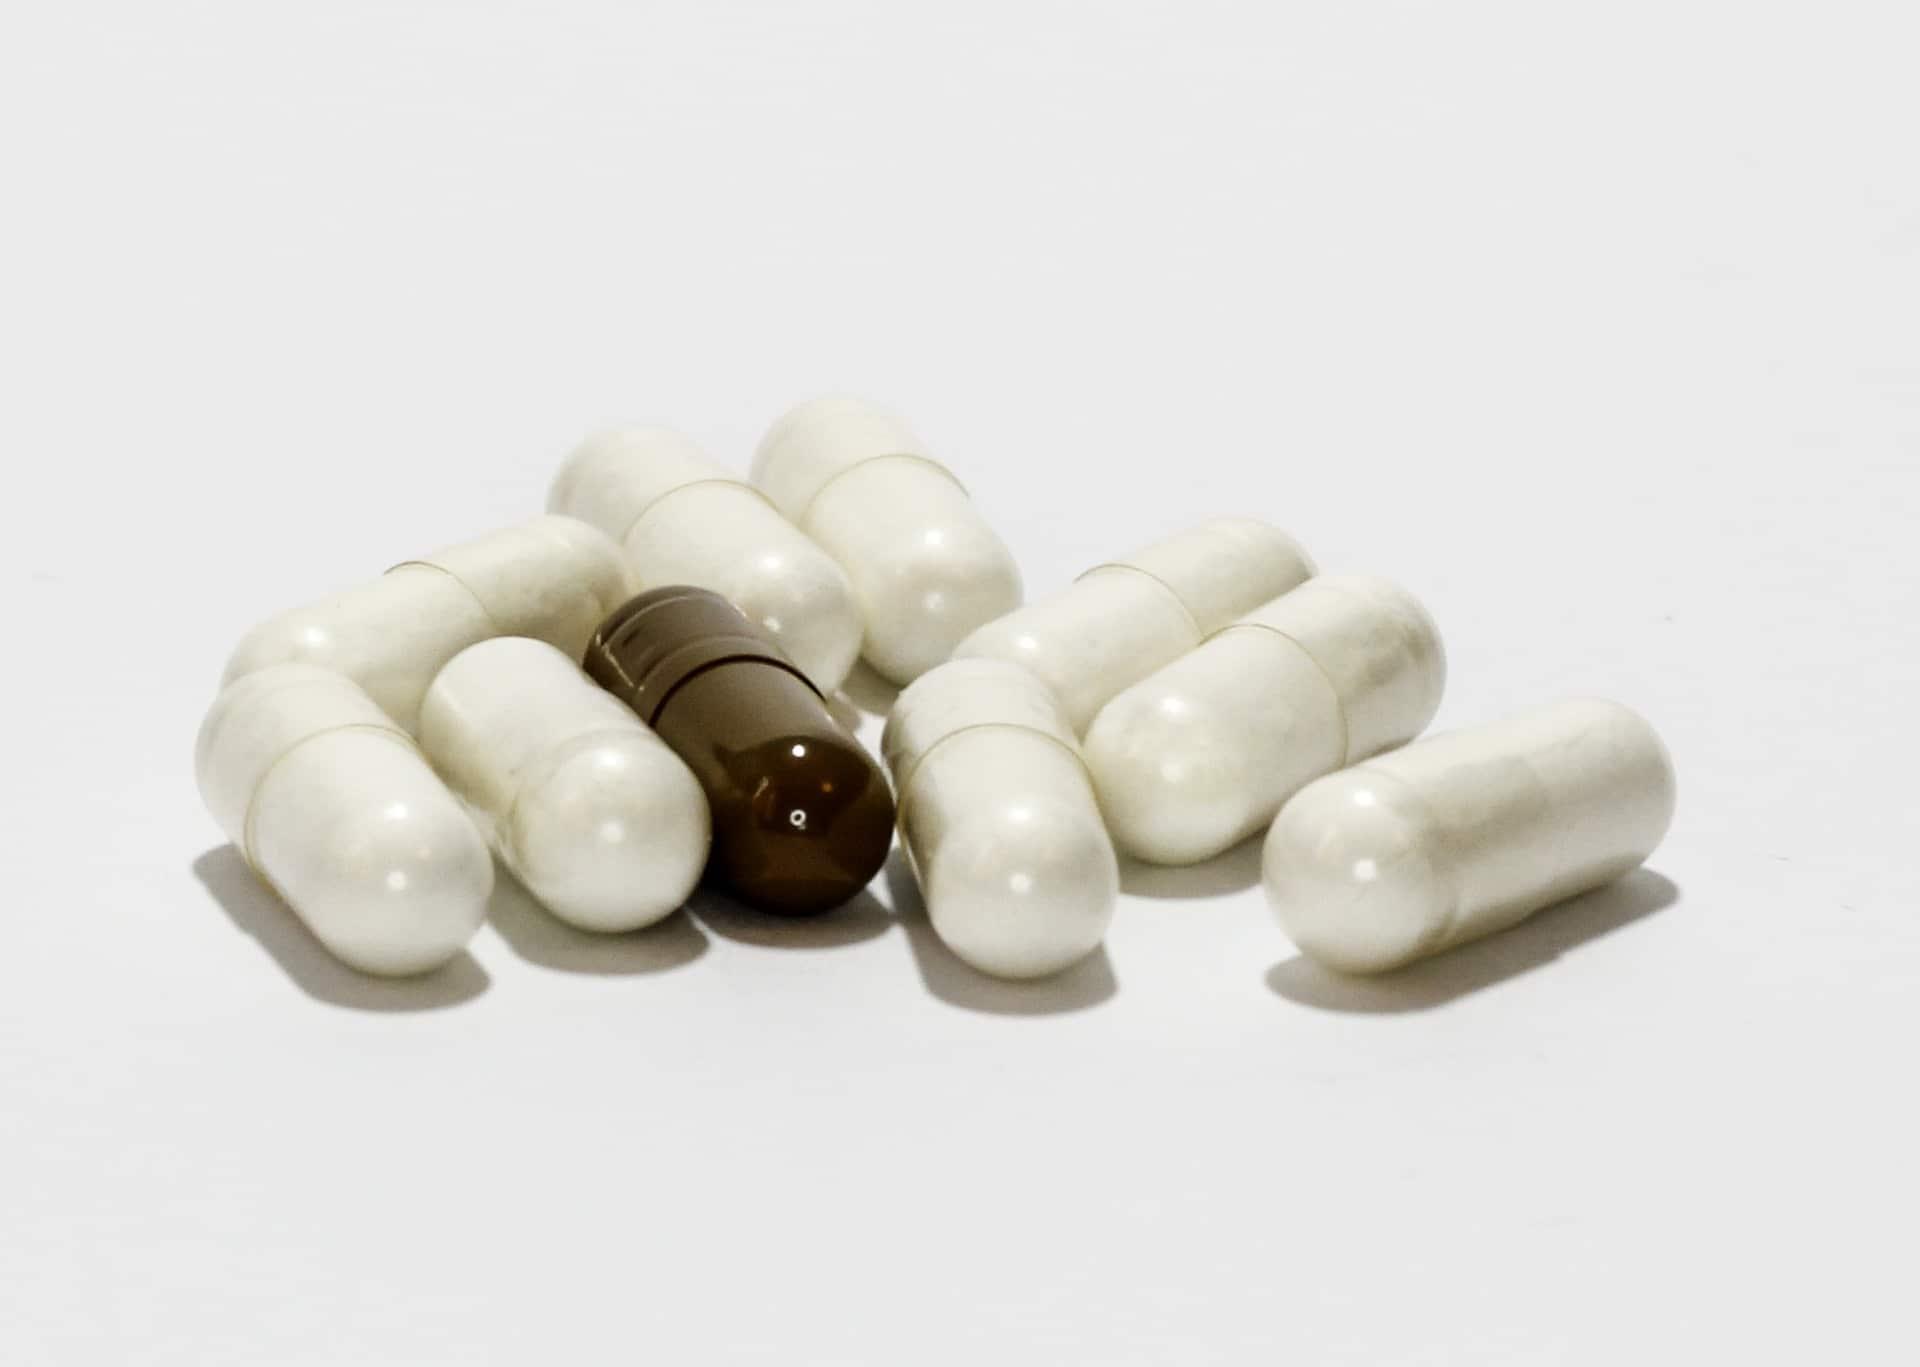 differece-between-parmodia-and-lipidil